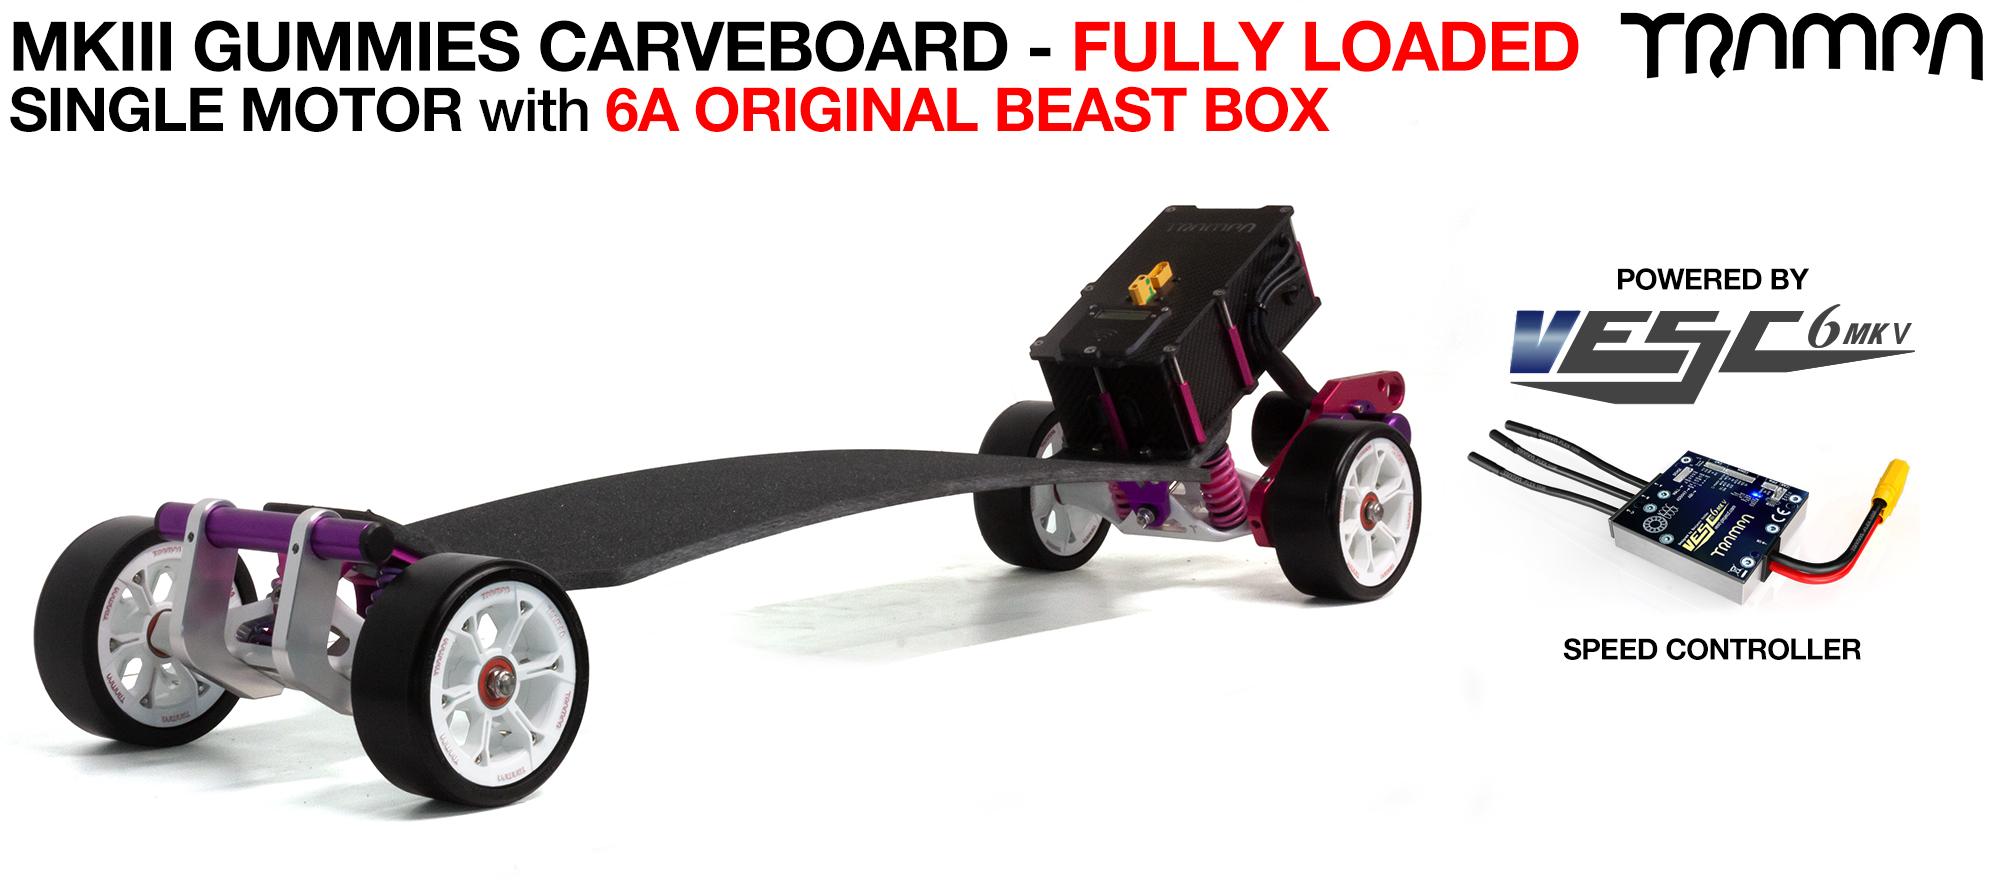 TRAMPA's MkIII Electric GUMMIES Carveboard - uses Mini Spring Trucks with MkIII Carve board Motor Mount,s Custom TRAMPA hubs & 125mm GUMMIES longboard Tyres - SINGLE Motor 6.2A FULLY LOADED